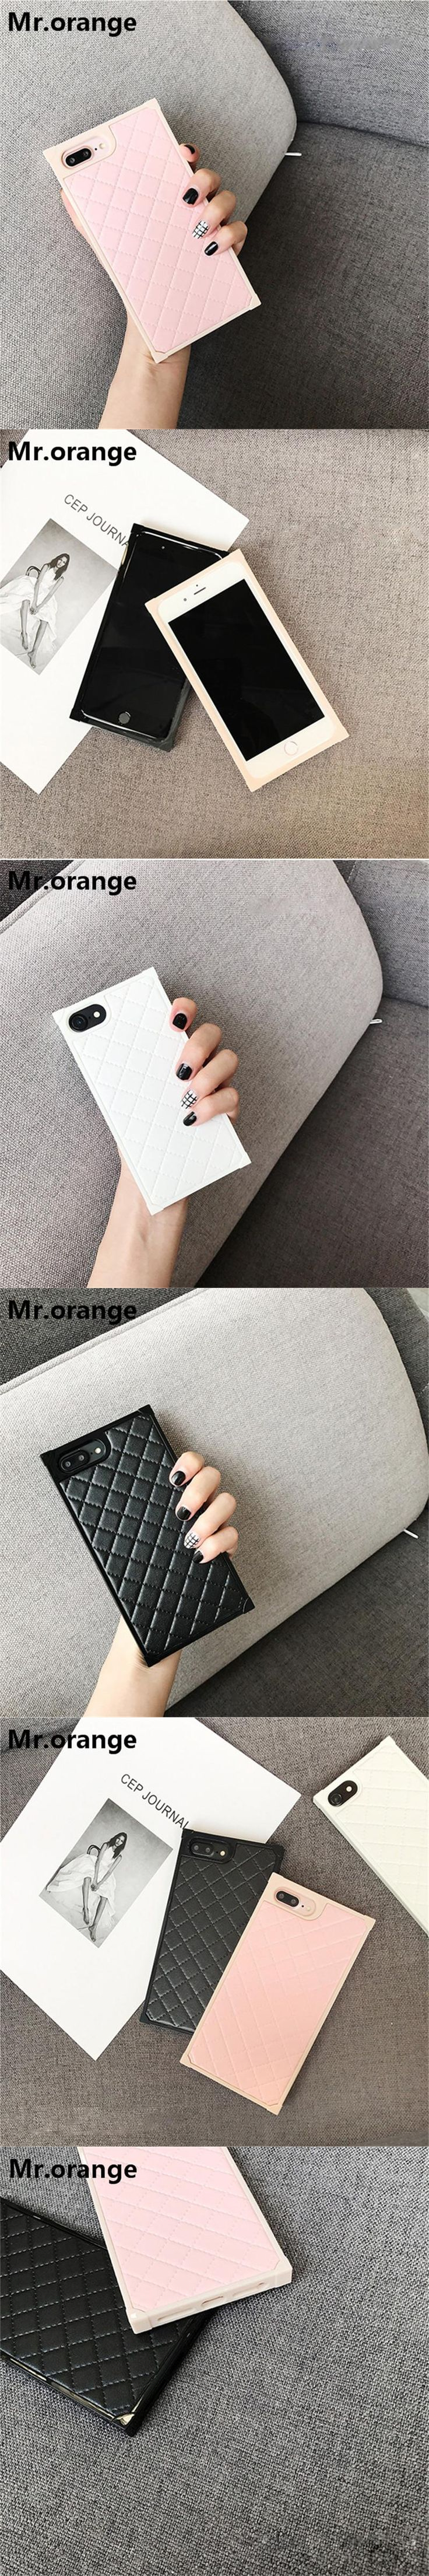 Mr.orange Phone Case For iPhone 6 6S 7 8 plus Case Luxury Women Diamond PU Phone Case Bag Cover Housing Sheepskin PU Cases HOT